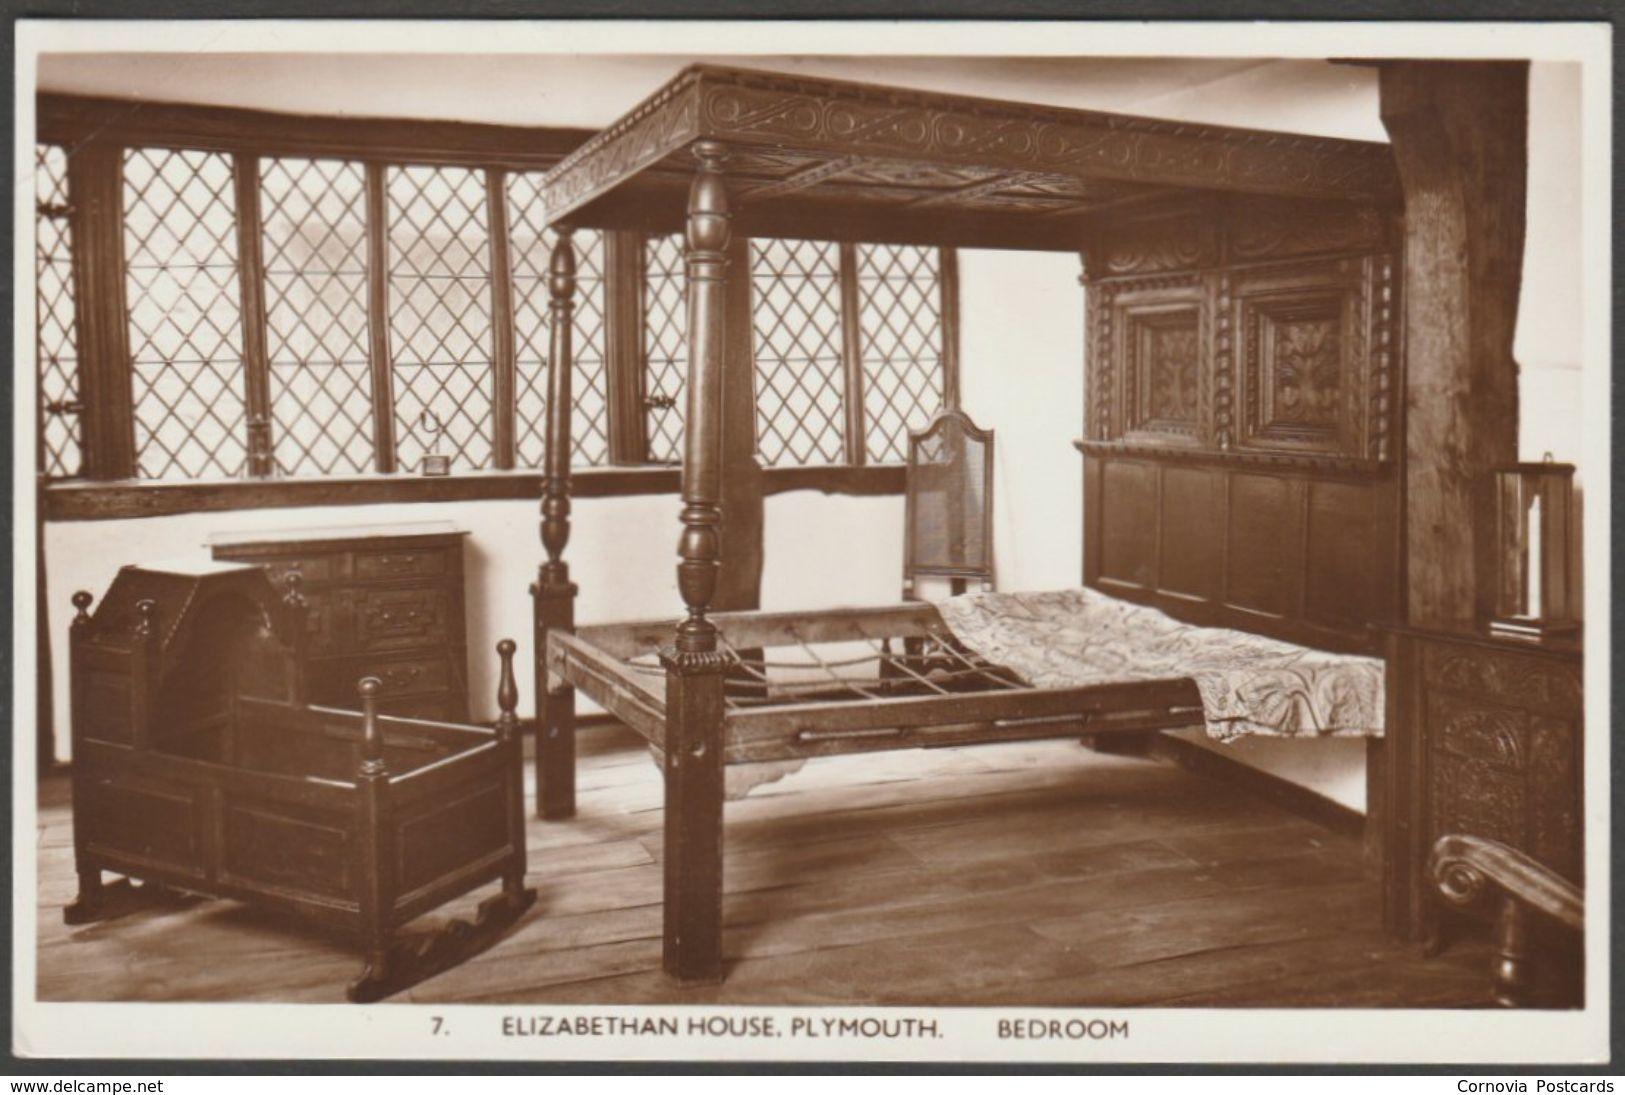 Bedroom Furniture set (Bed, Headboard, Wardrobe, Beside Table, Drawers x2)